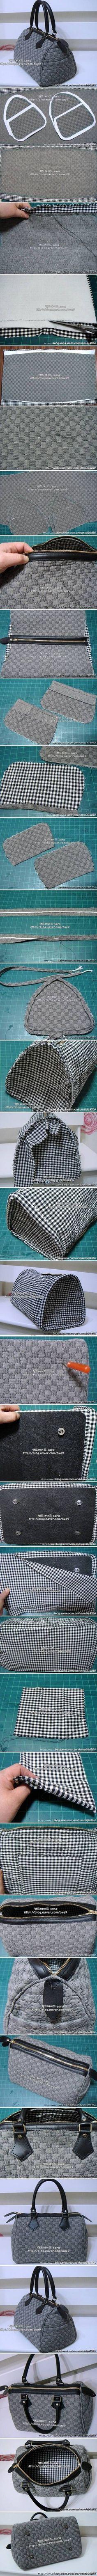 DIY Nice Fashionable Handbag fashion nice handbag diy easy crafts diy ideas diy crafts do it yourself easy diy diy handbag diy purse craft fashion easy diy craft ideas